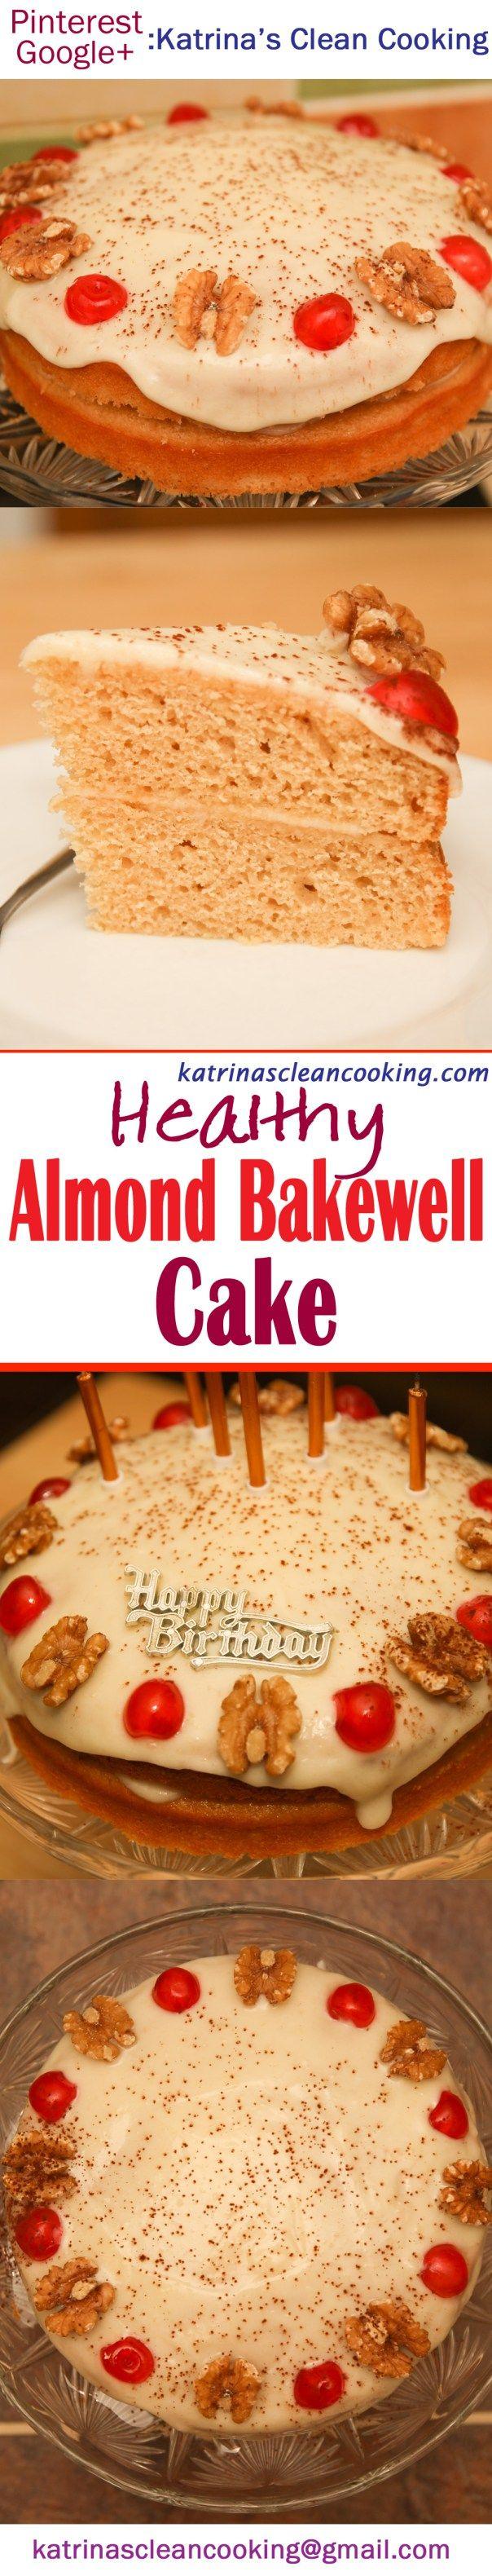 Healthy Almond Bakewell Cake #healthy #highprotein #glutenfree #refinedsugarfree